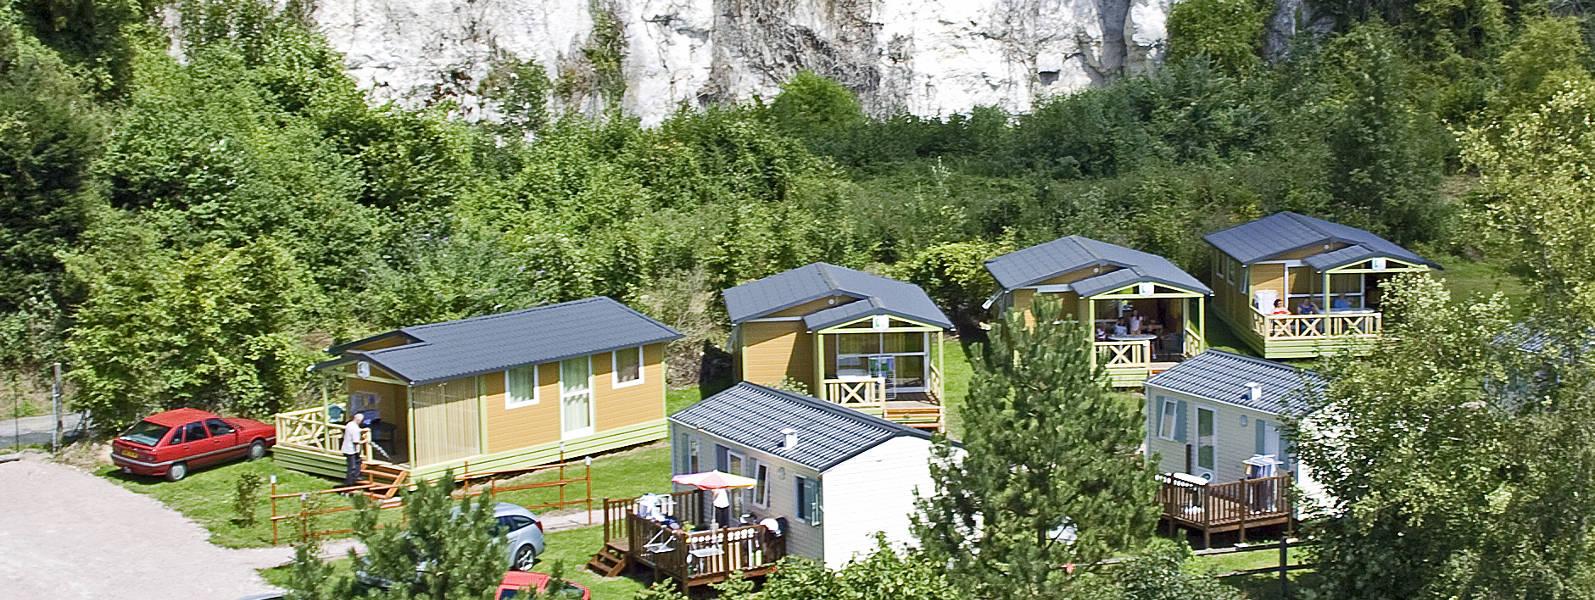 camping normandie 3 etoiles